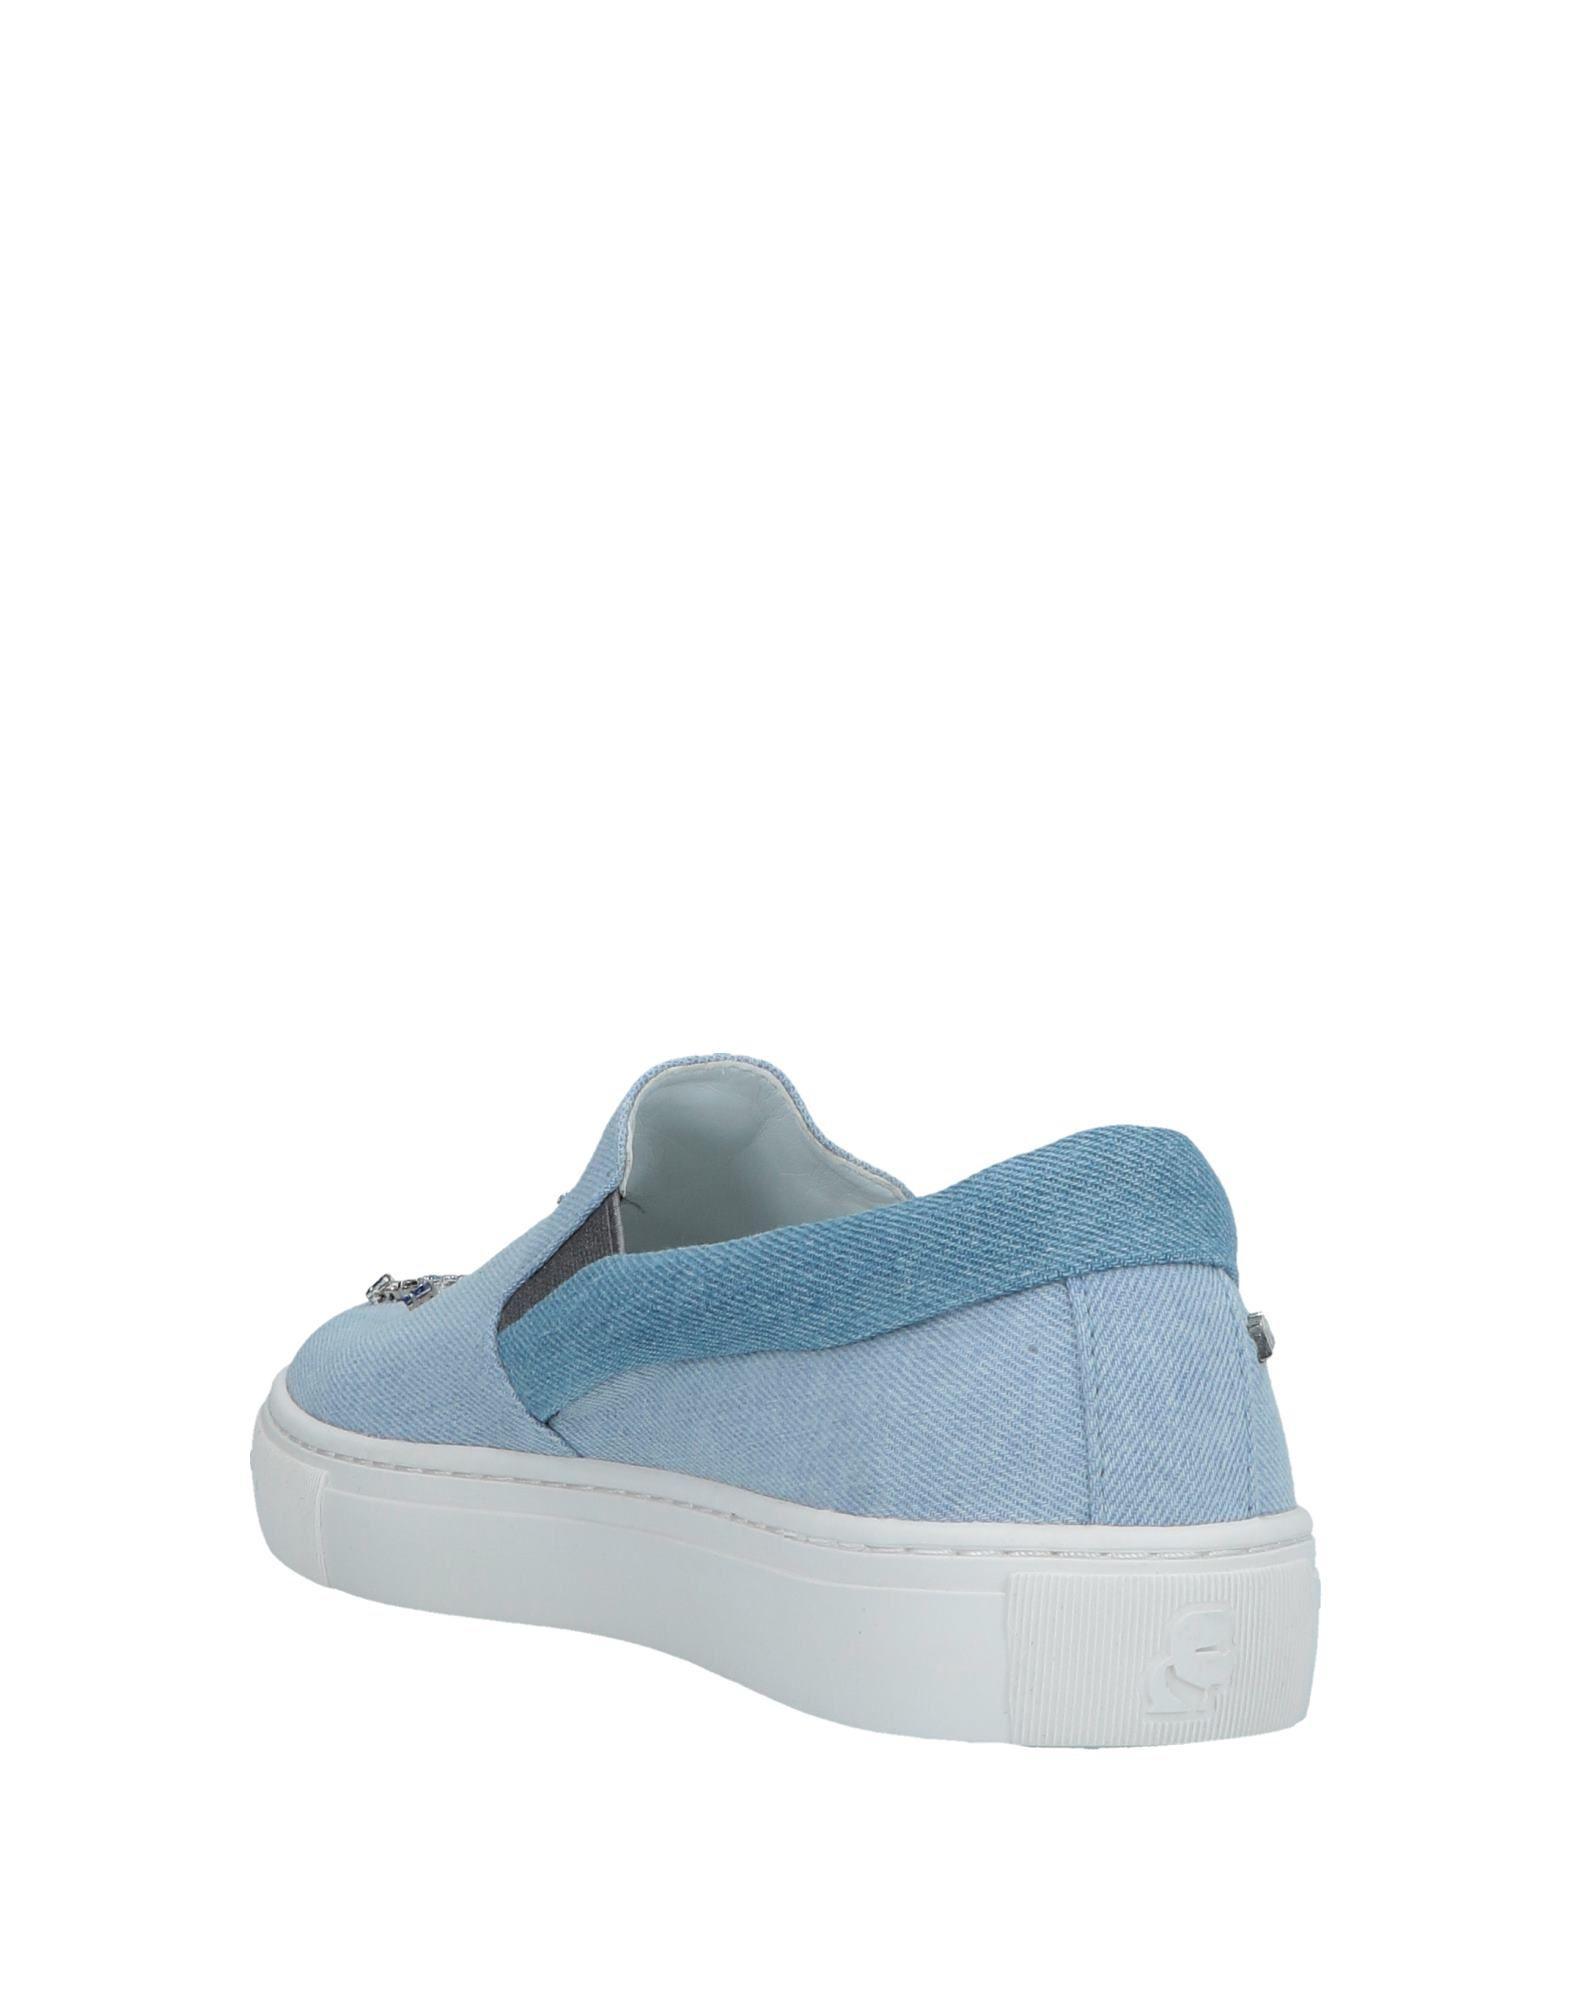 premium selection c100b 51b83 Lyst - Karl Lagerfeld Low-tops  Sneakers in Blue